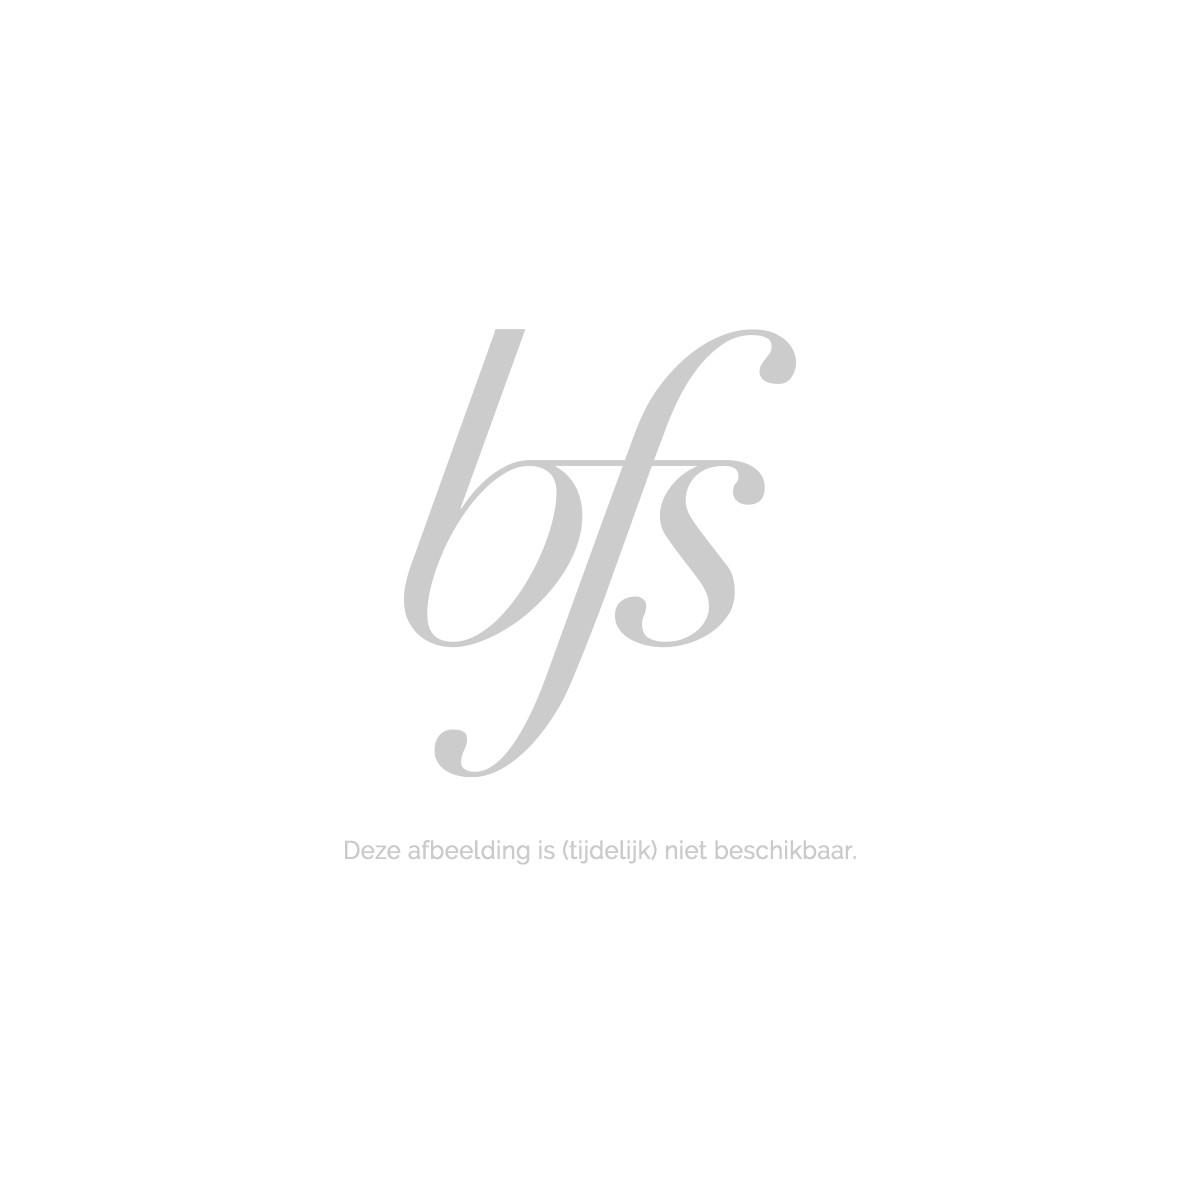 Chanel Inimitable Intense Mascara #20 Brun